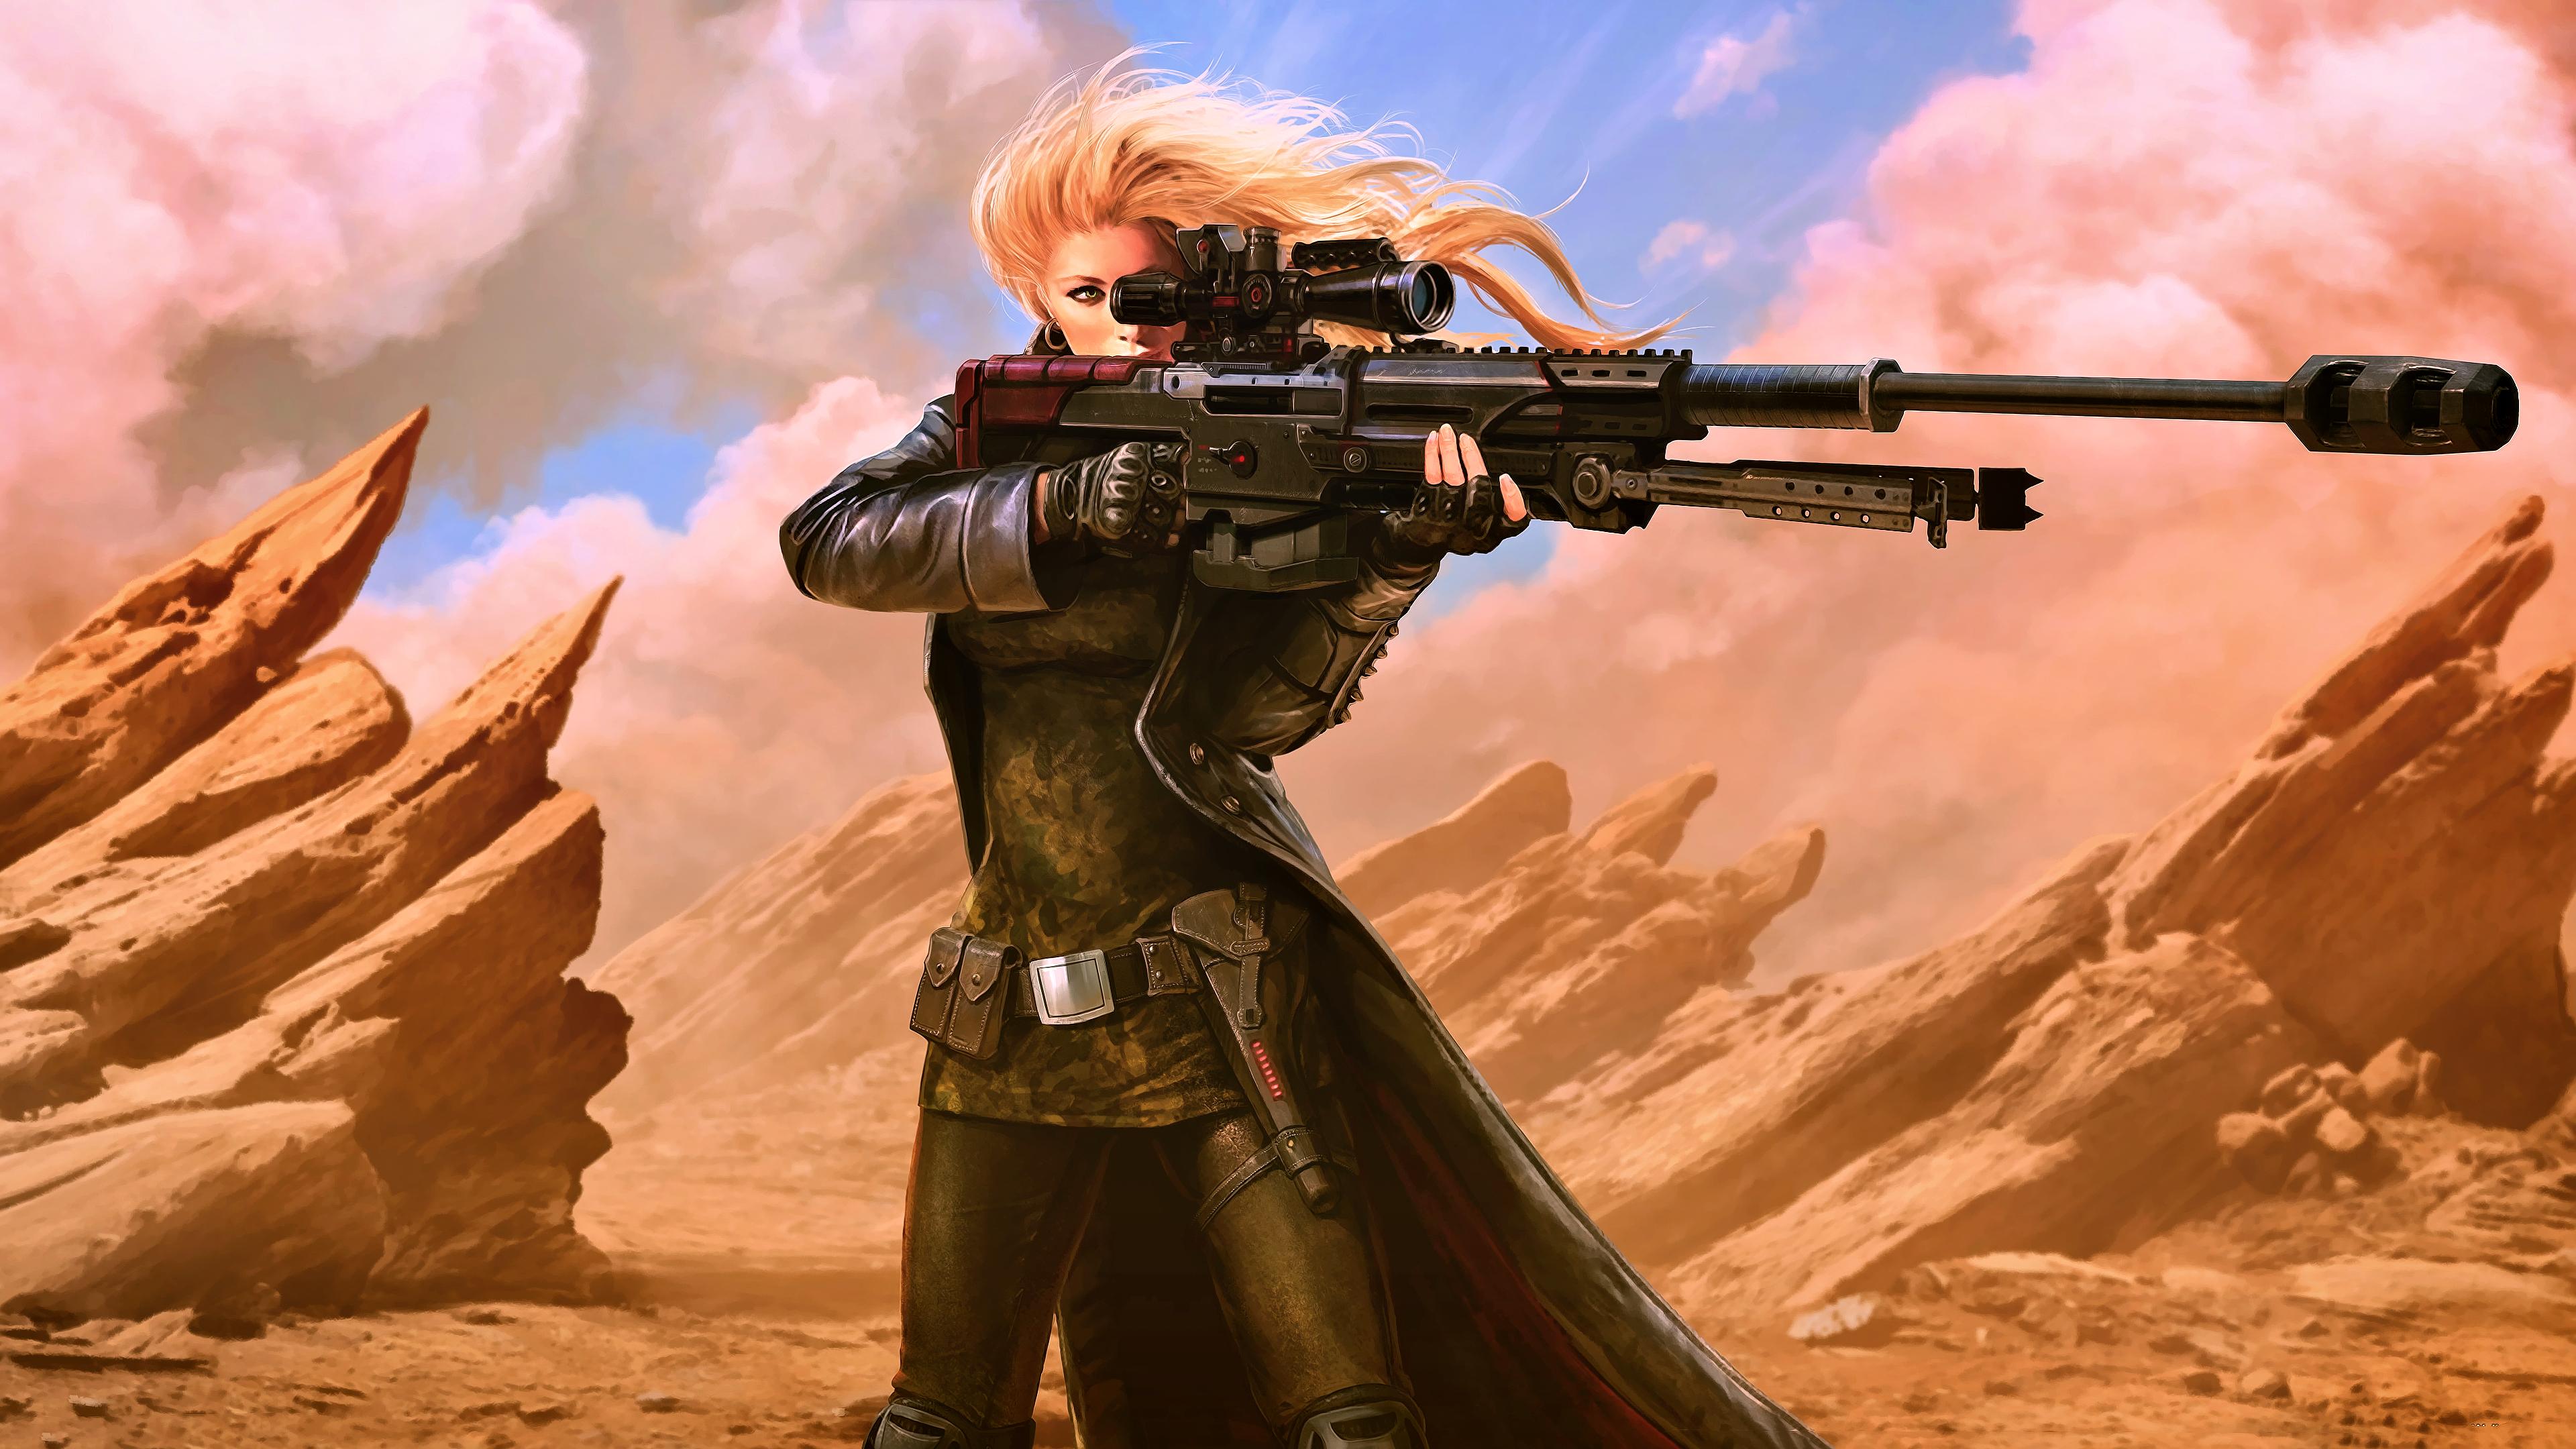 General 3840x2160 artwork science fiction digital art concept art fantasy art futuristic girls with guns sniper rifle